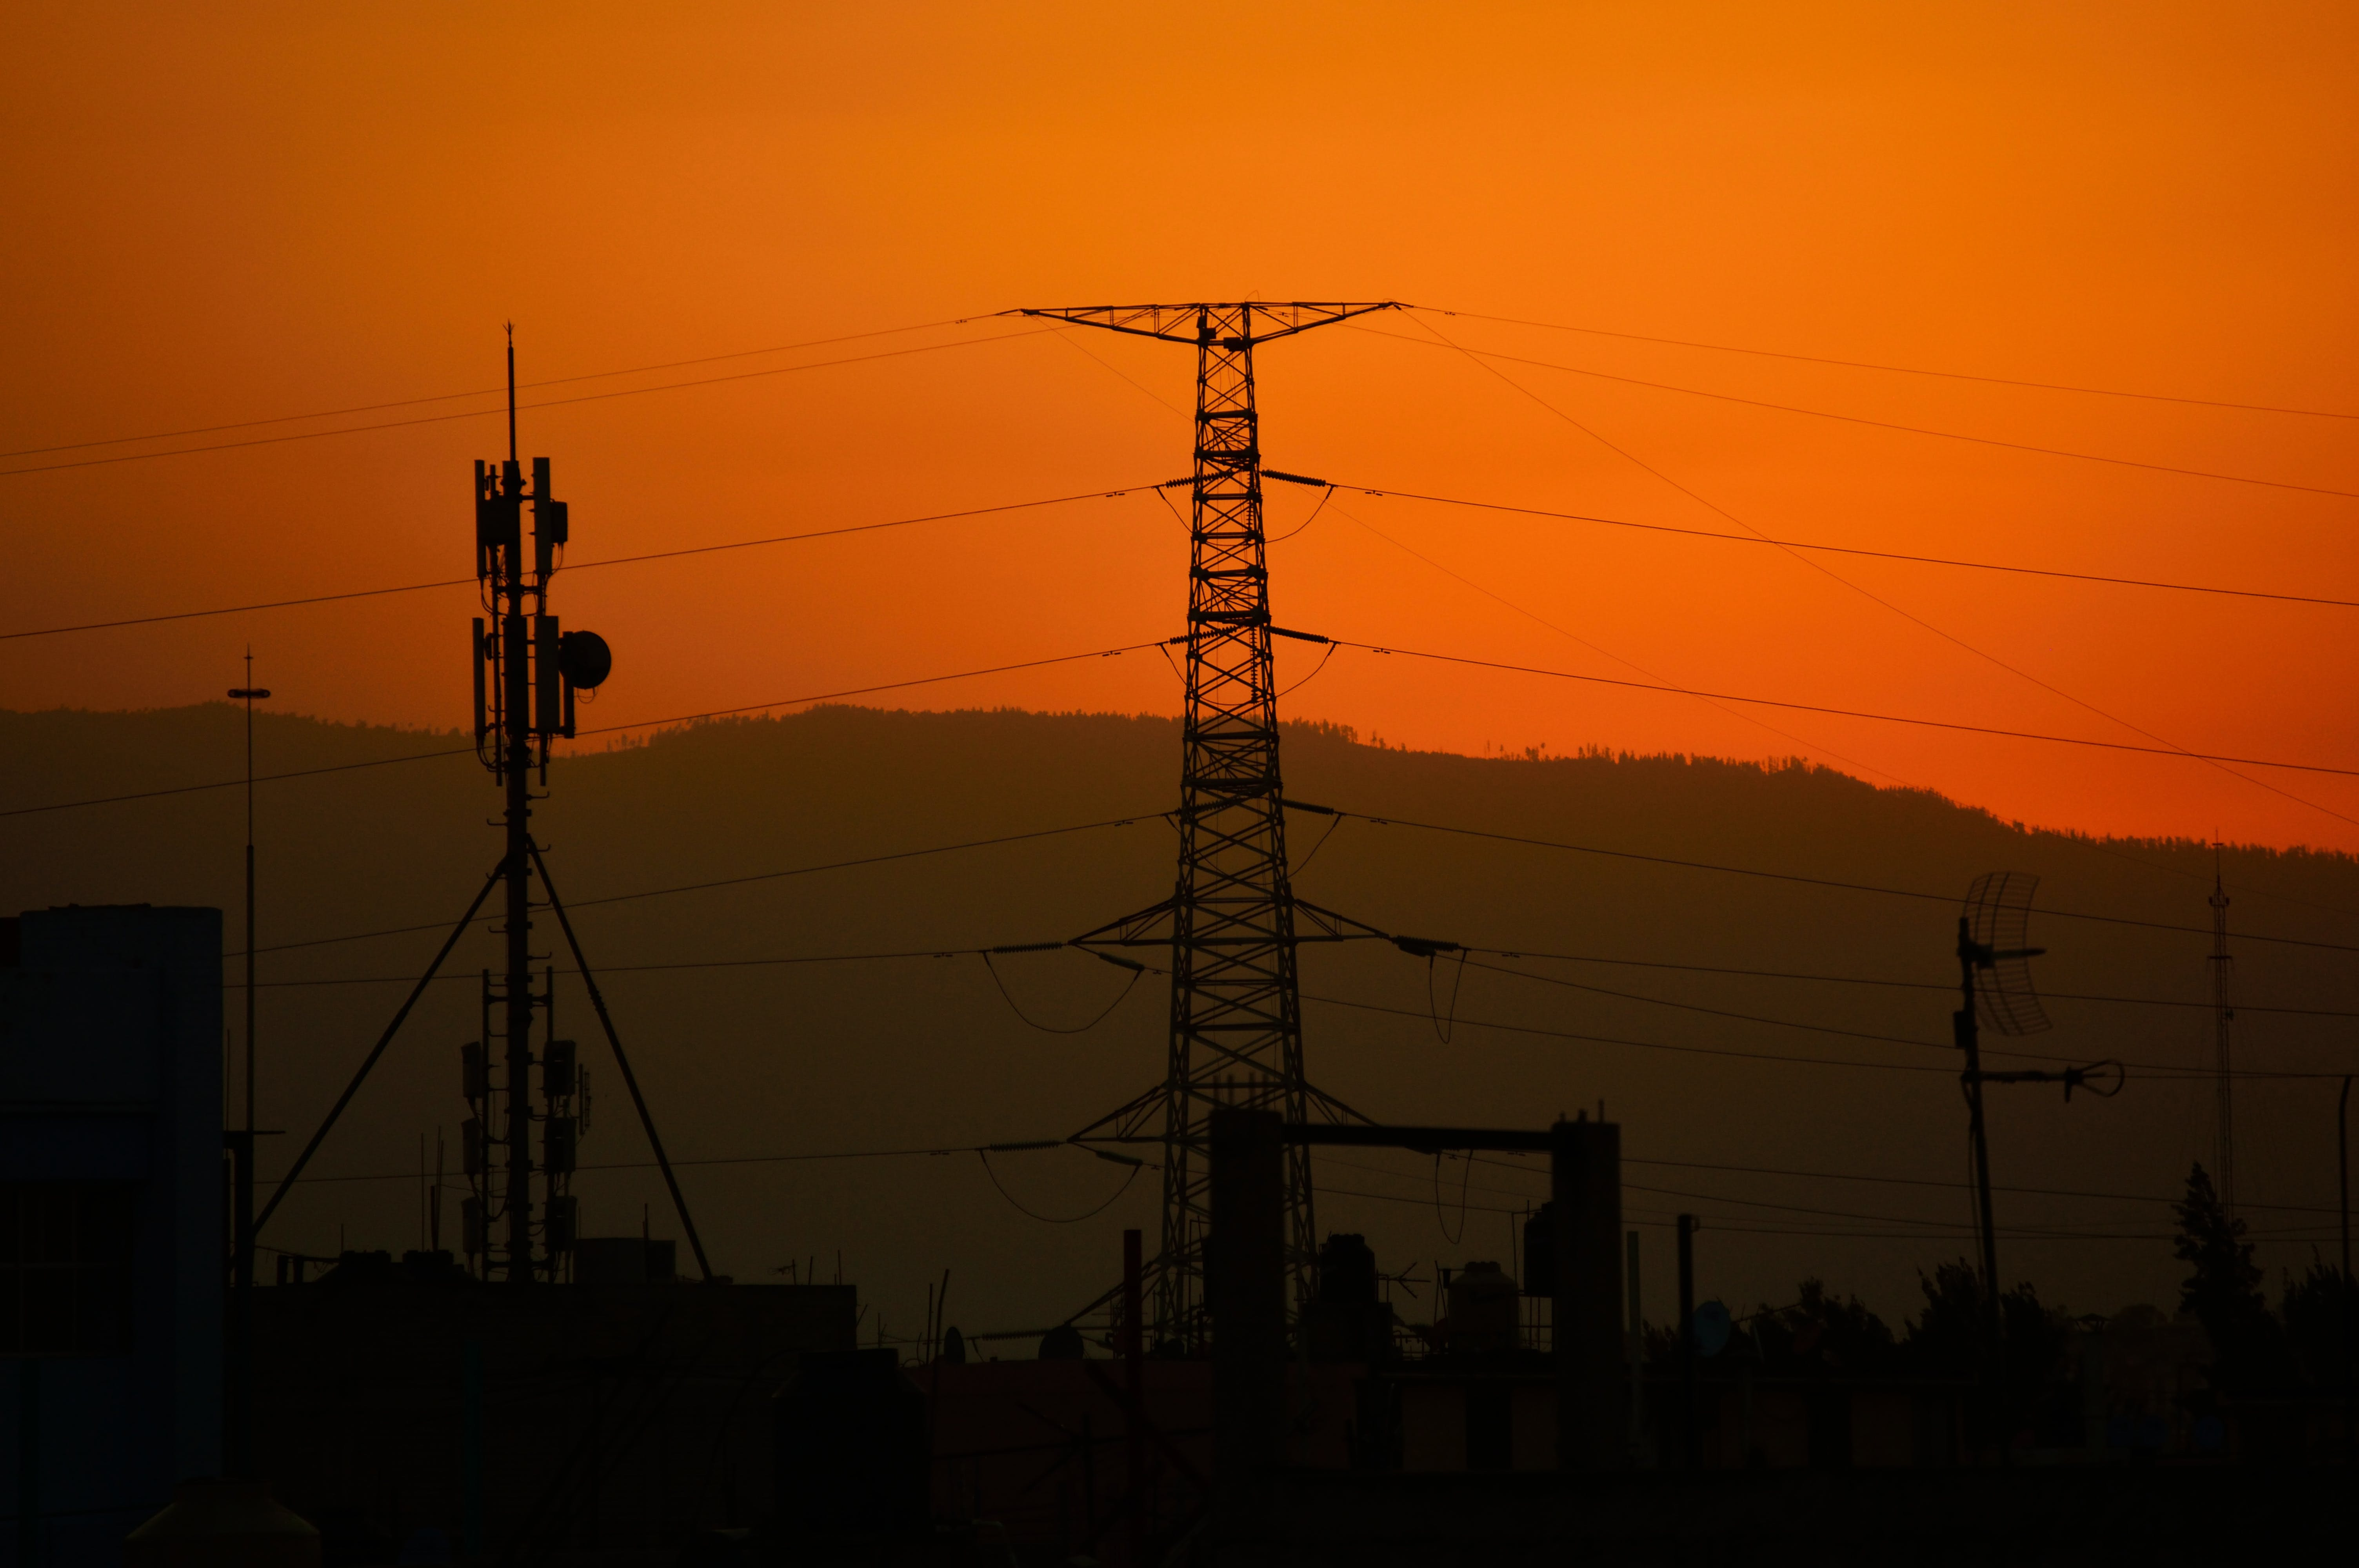 dawn, dusk, electricity